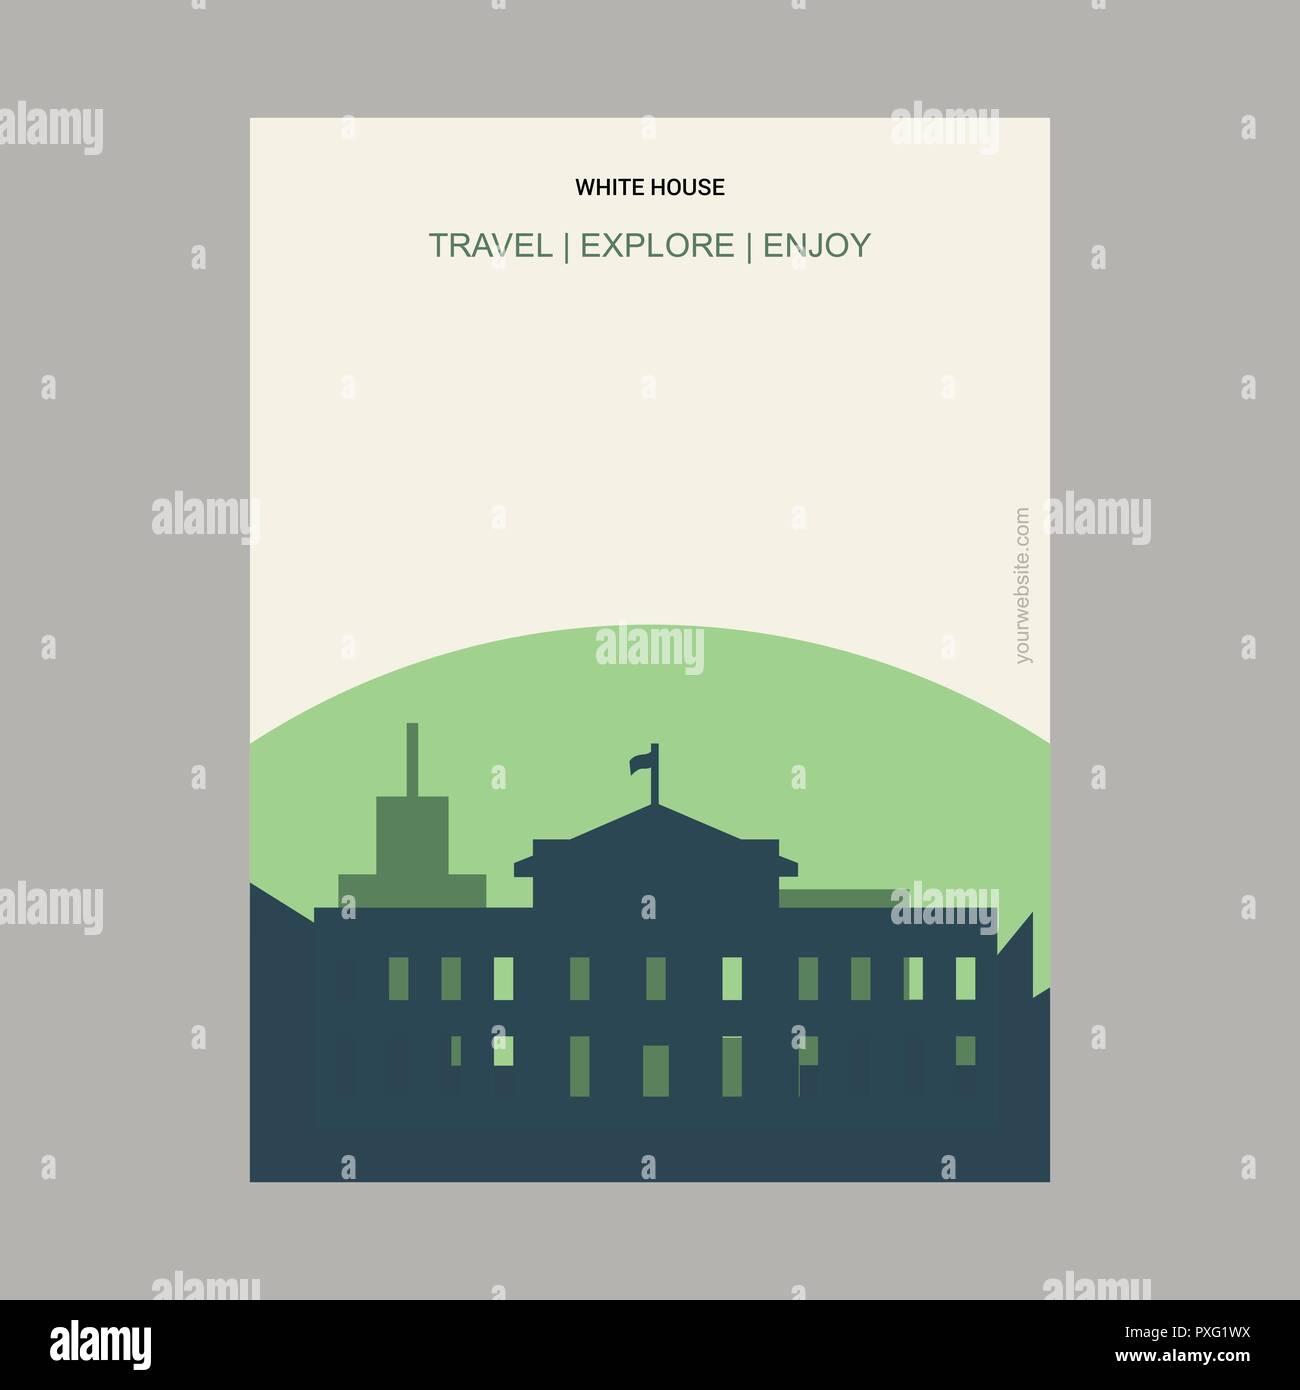 White house Washington, D.C.  U.S.A Vintage Style Landmark Poster Template - Stock Vector